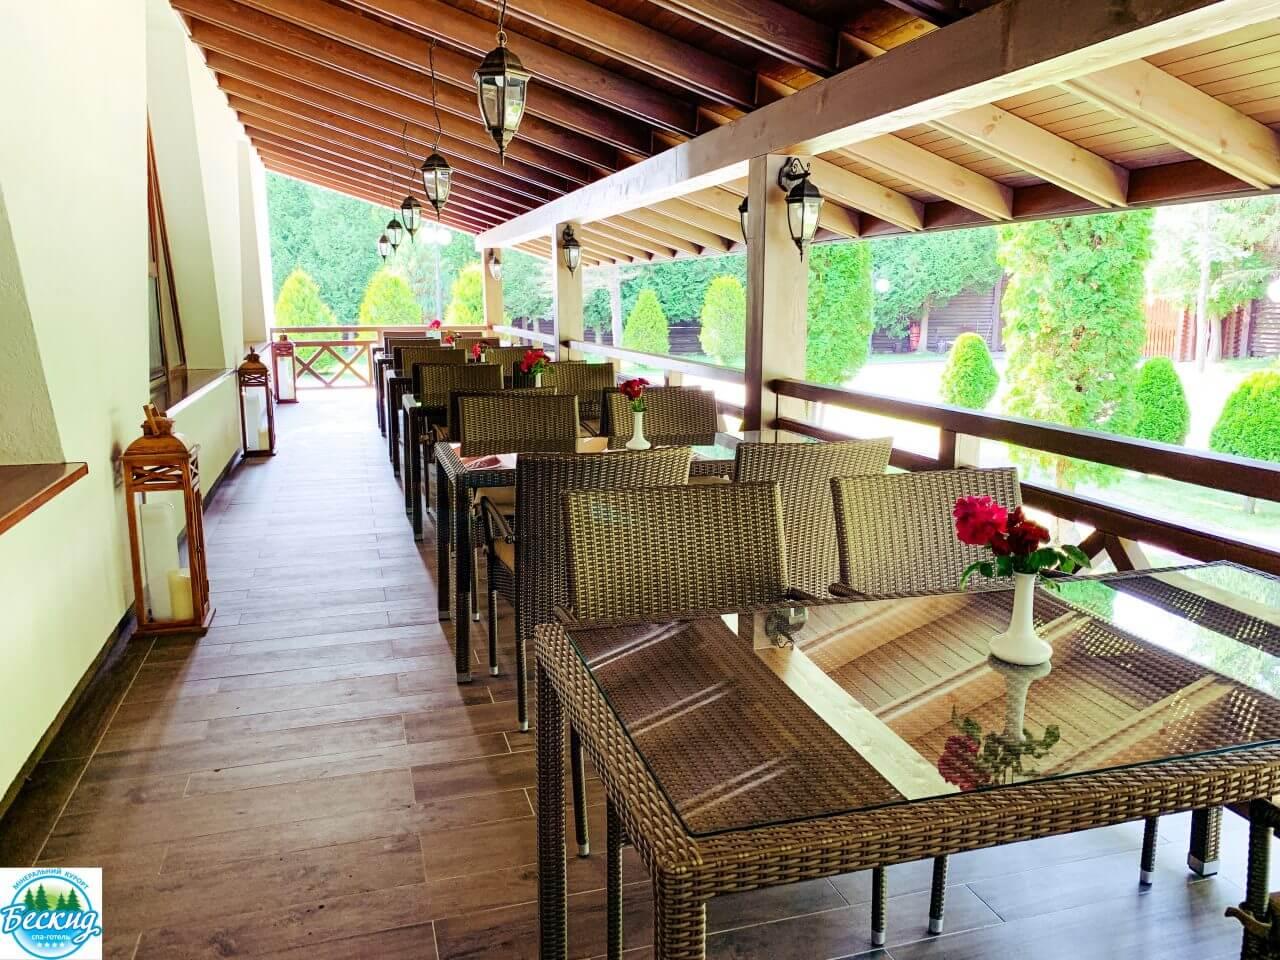 Терраса ресторана Бескид